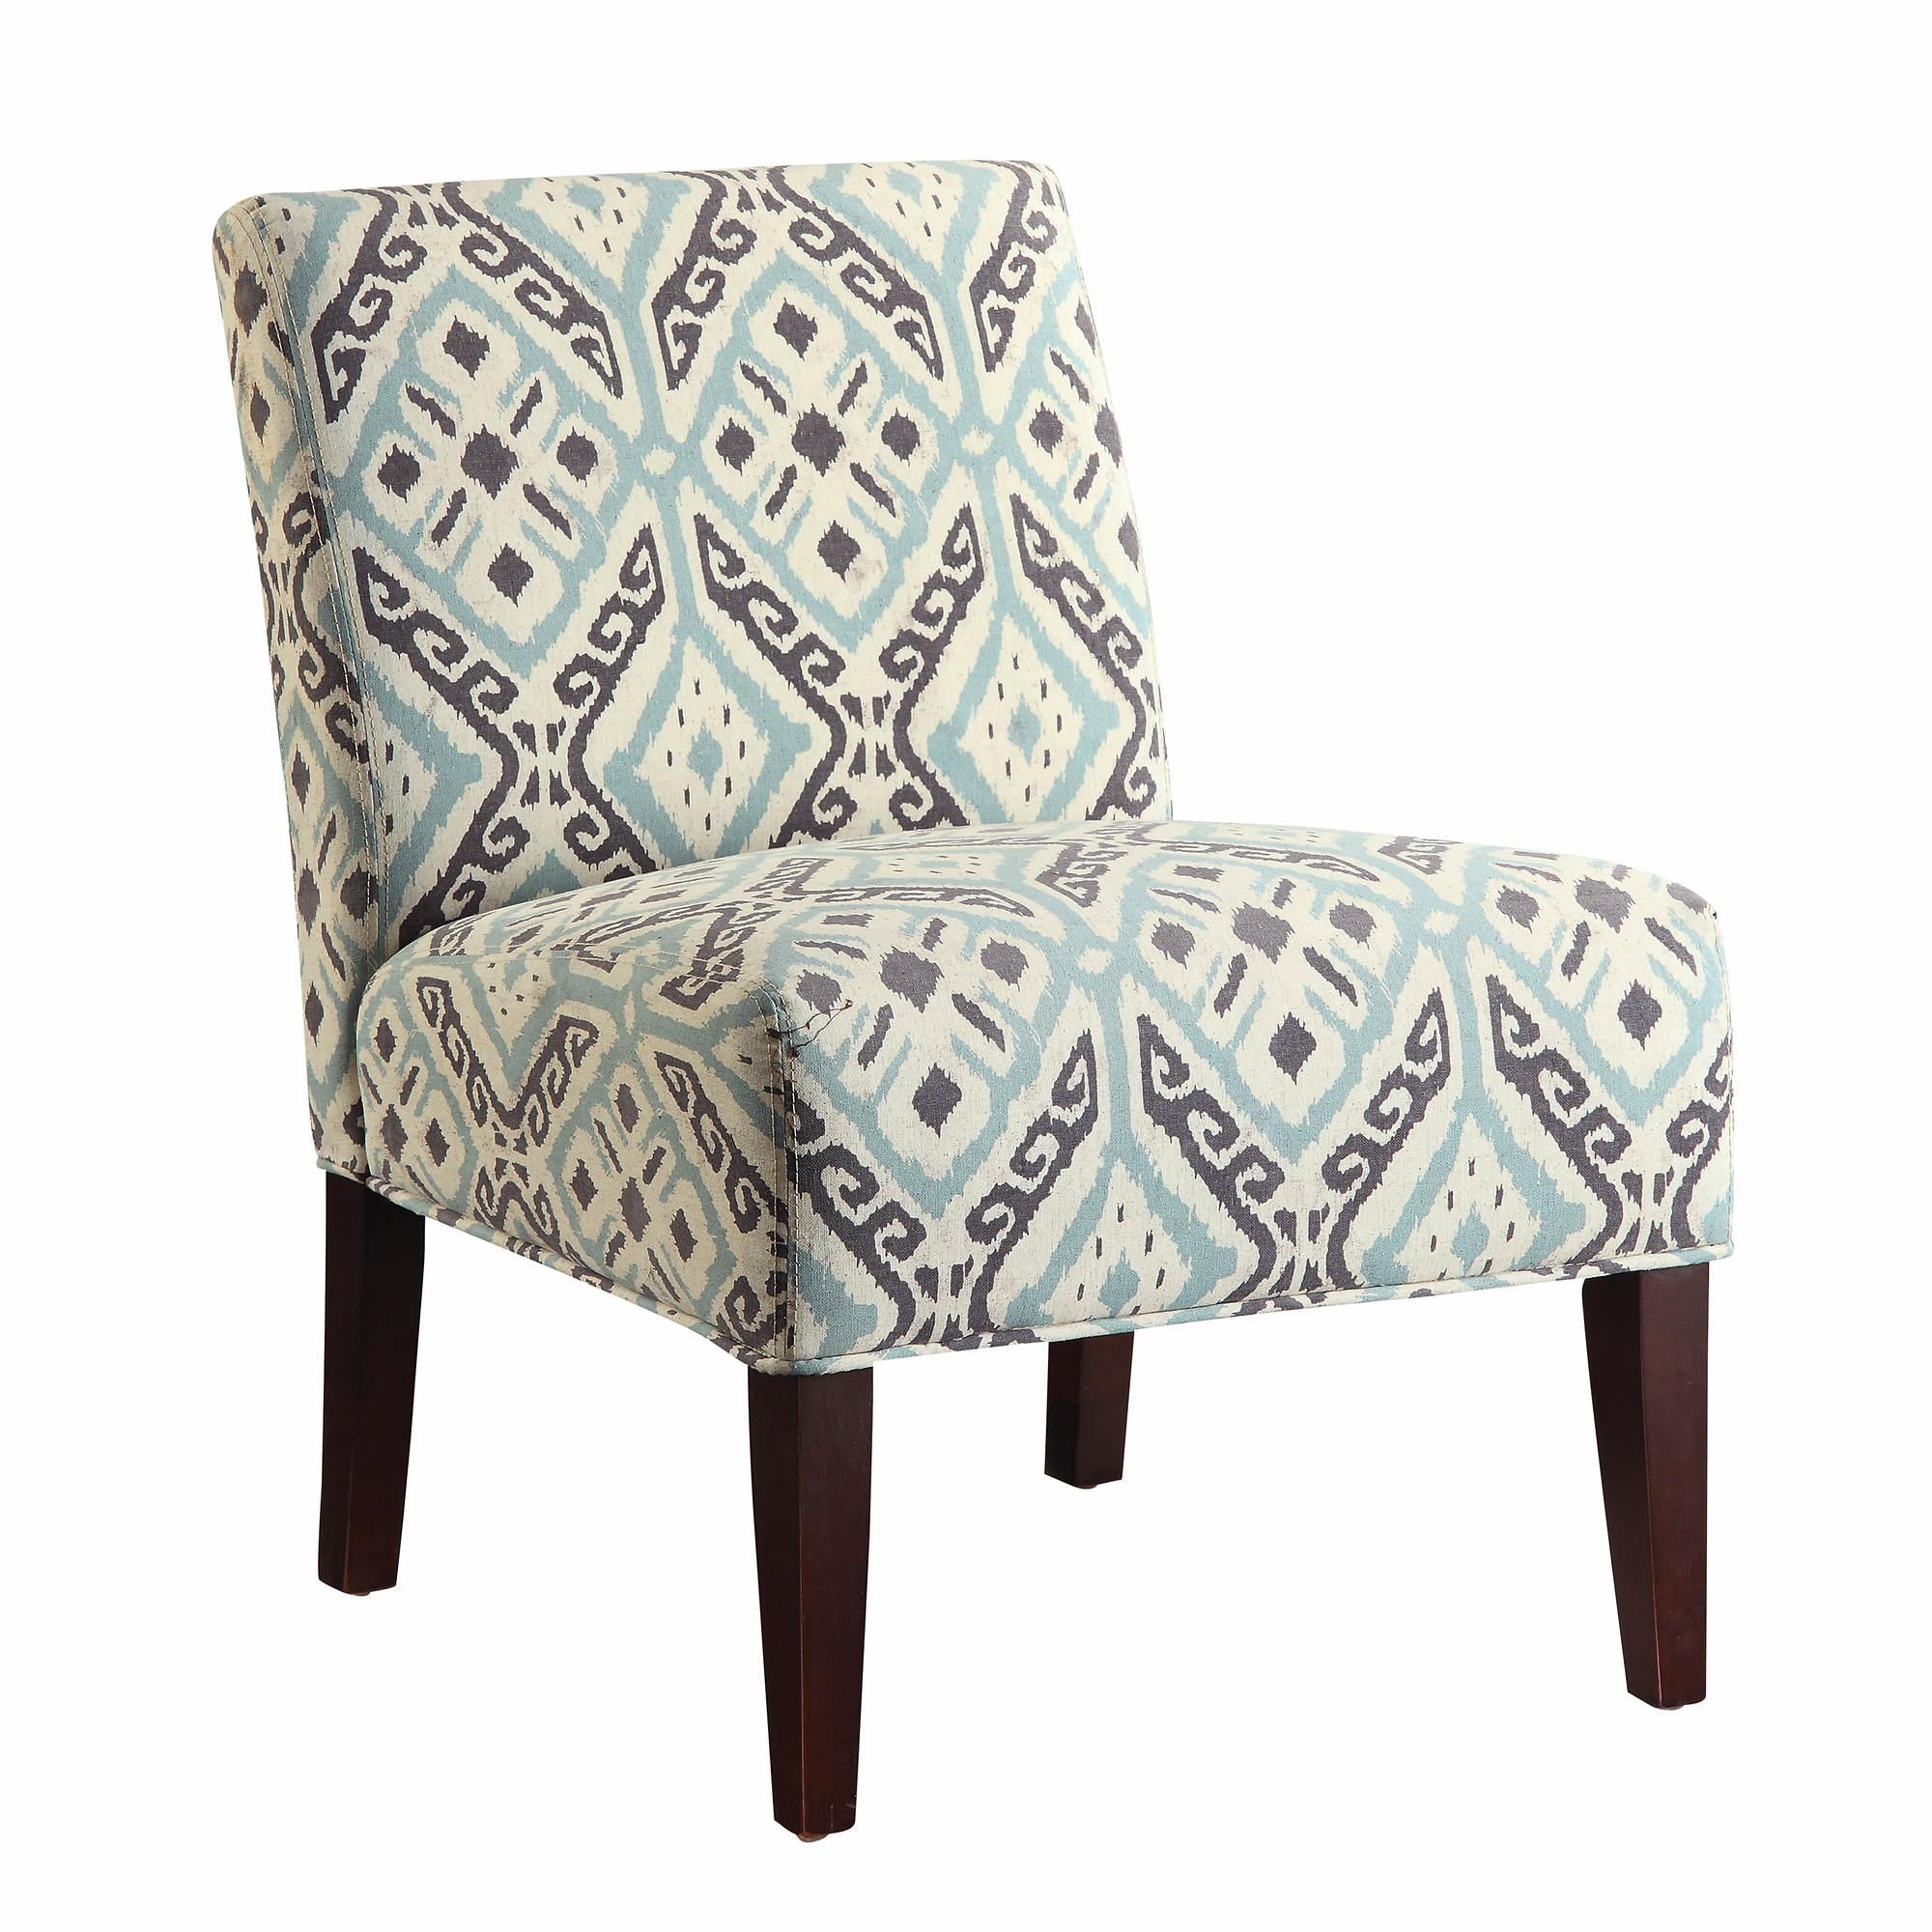 Coaster Accent Chair Beige Teal Brown Bjs Wholesale Club